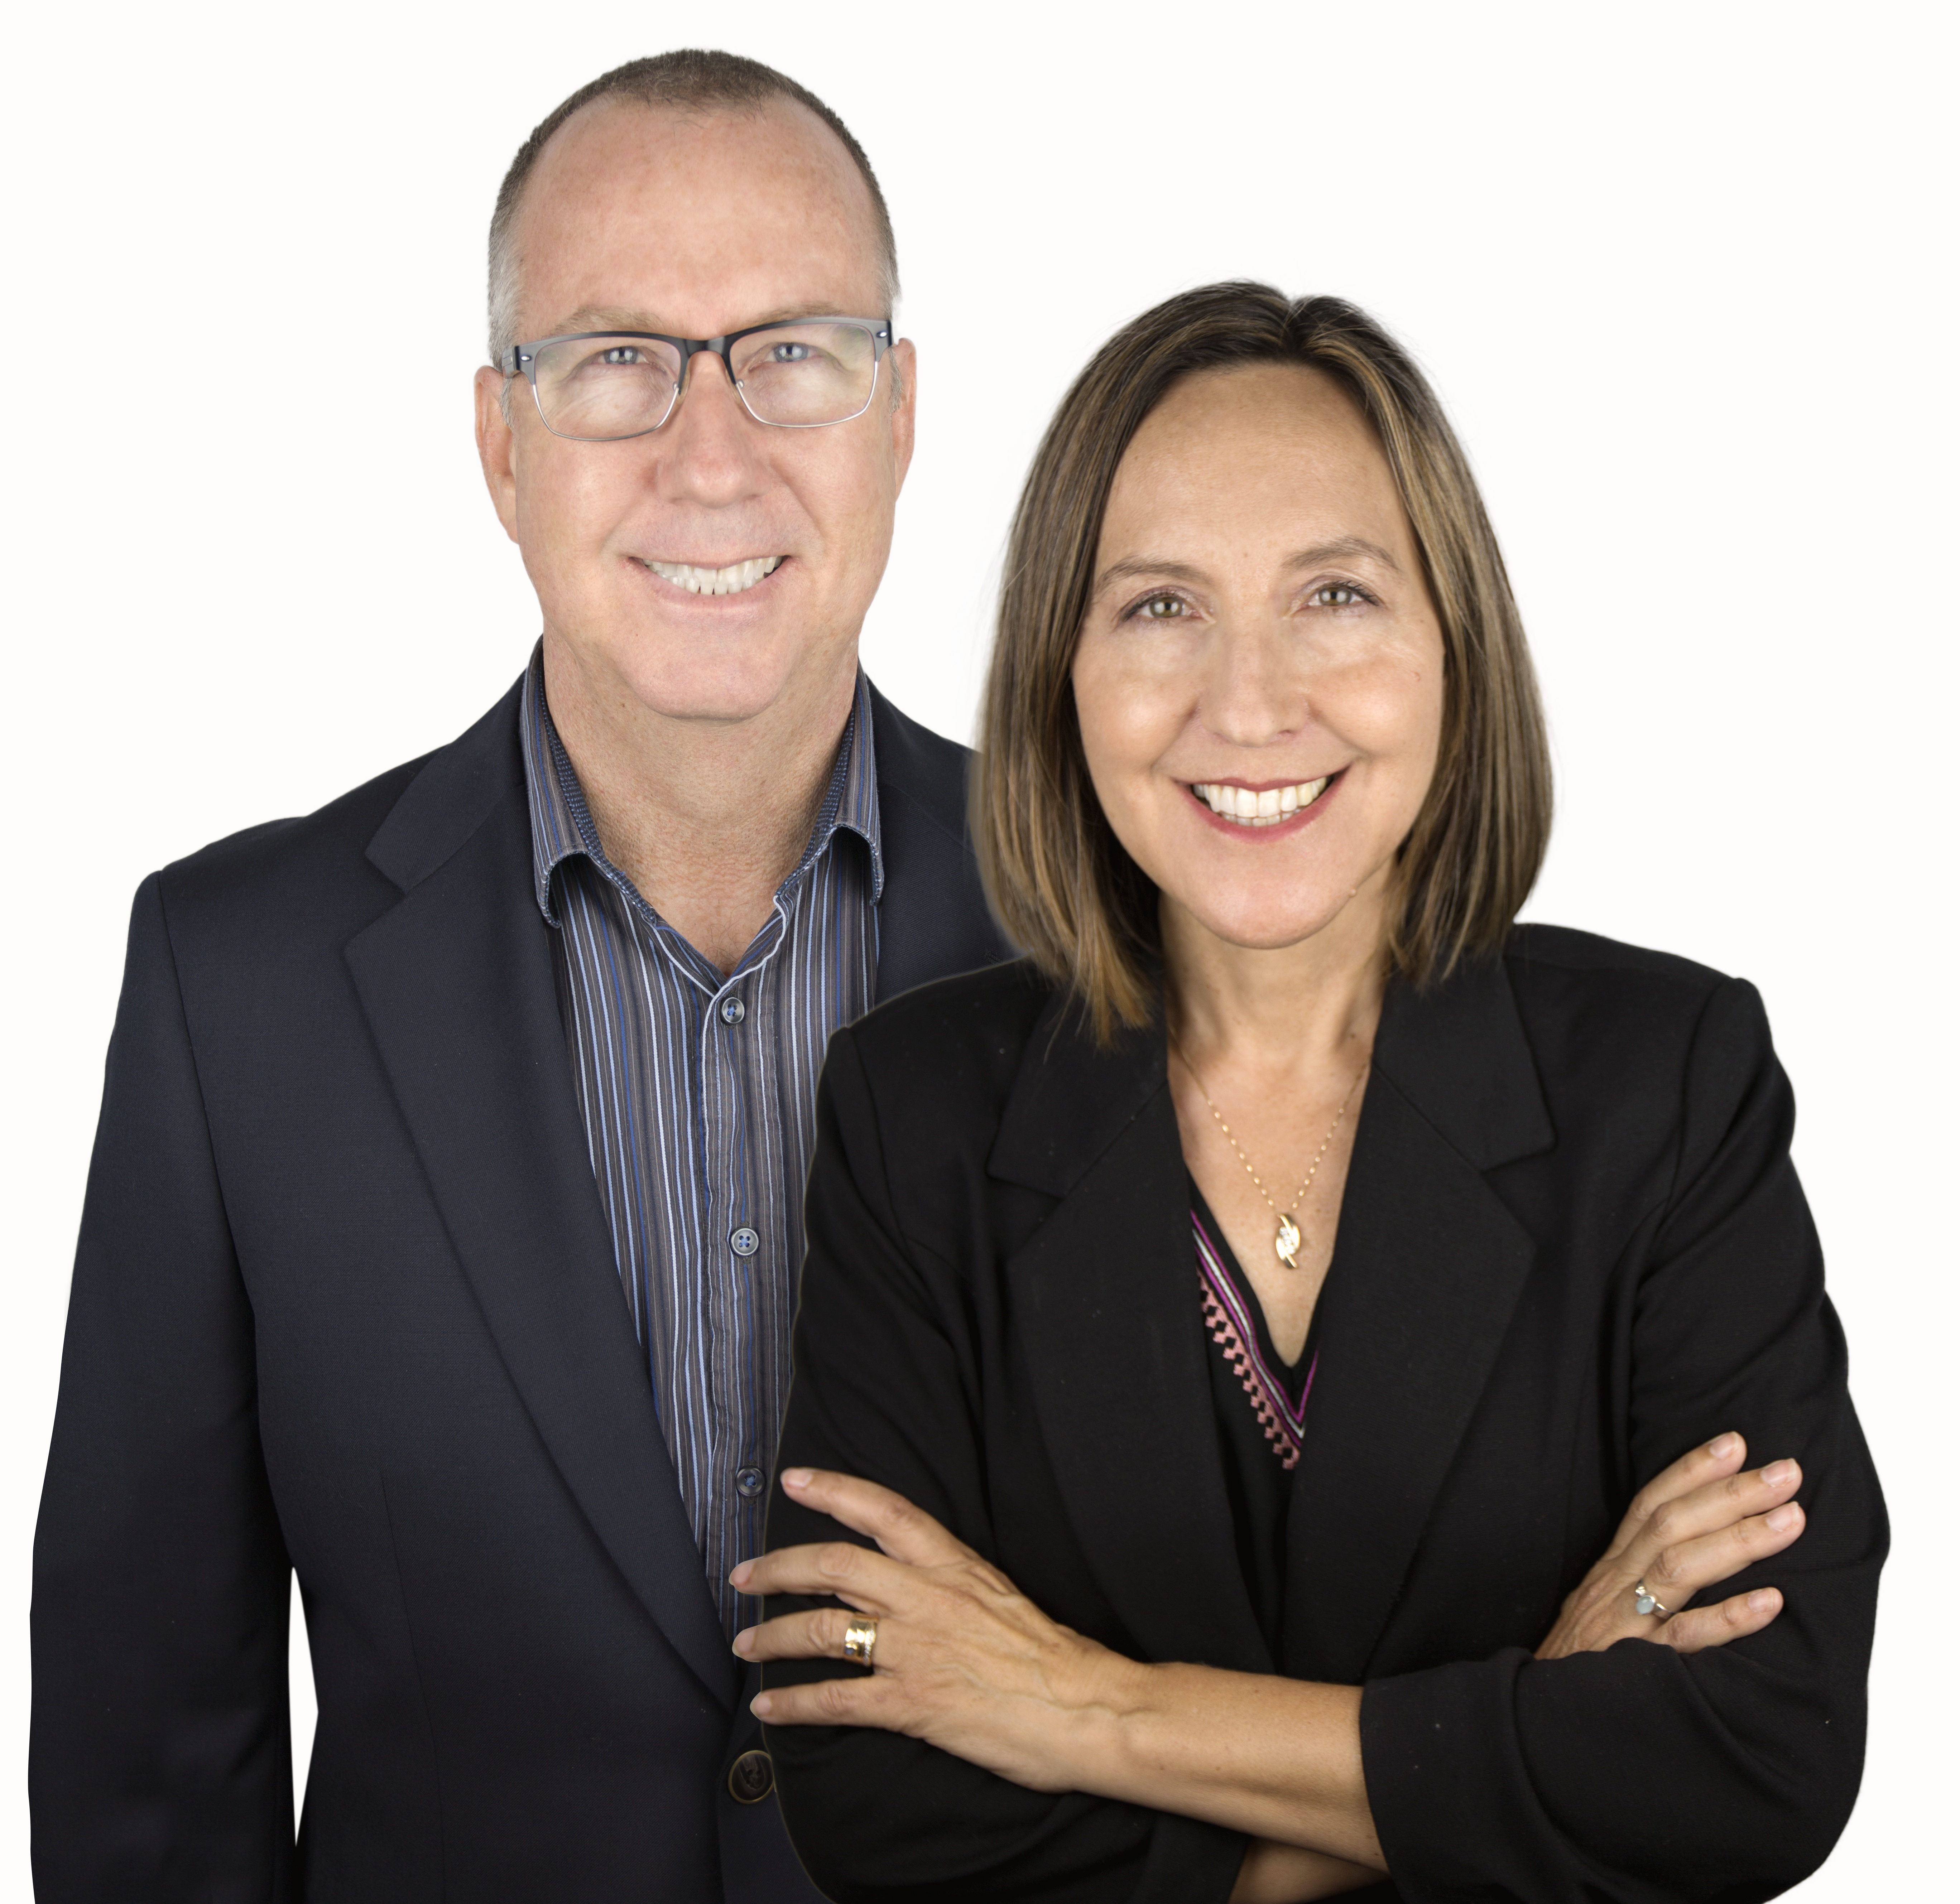 Steve and Sylvia Crossland